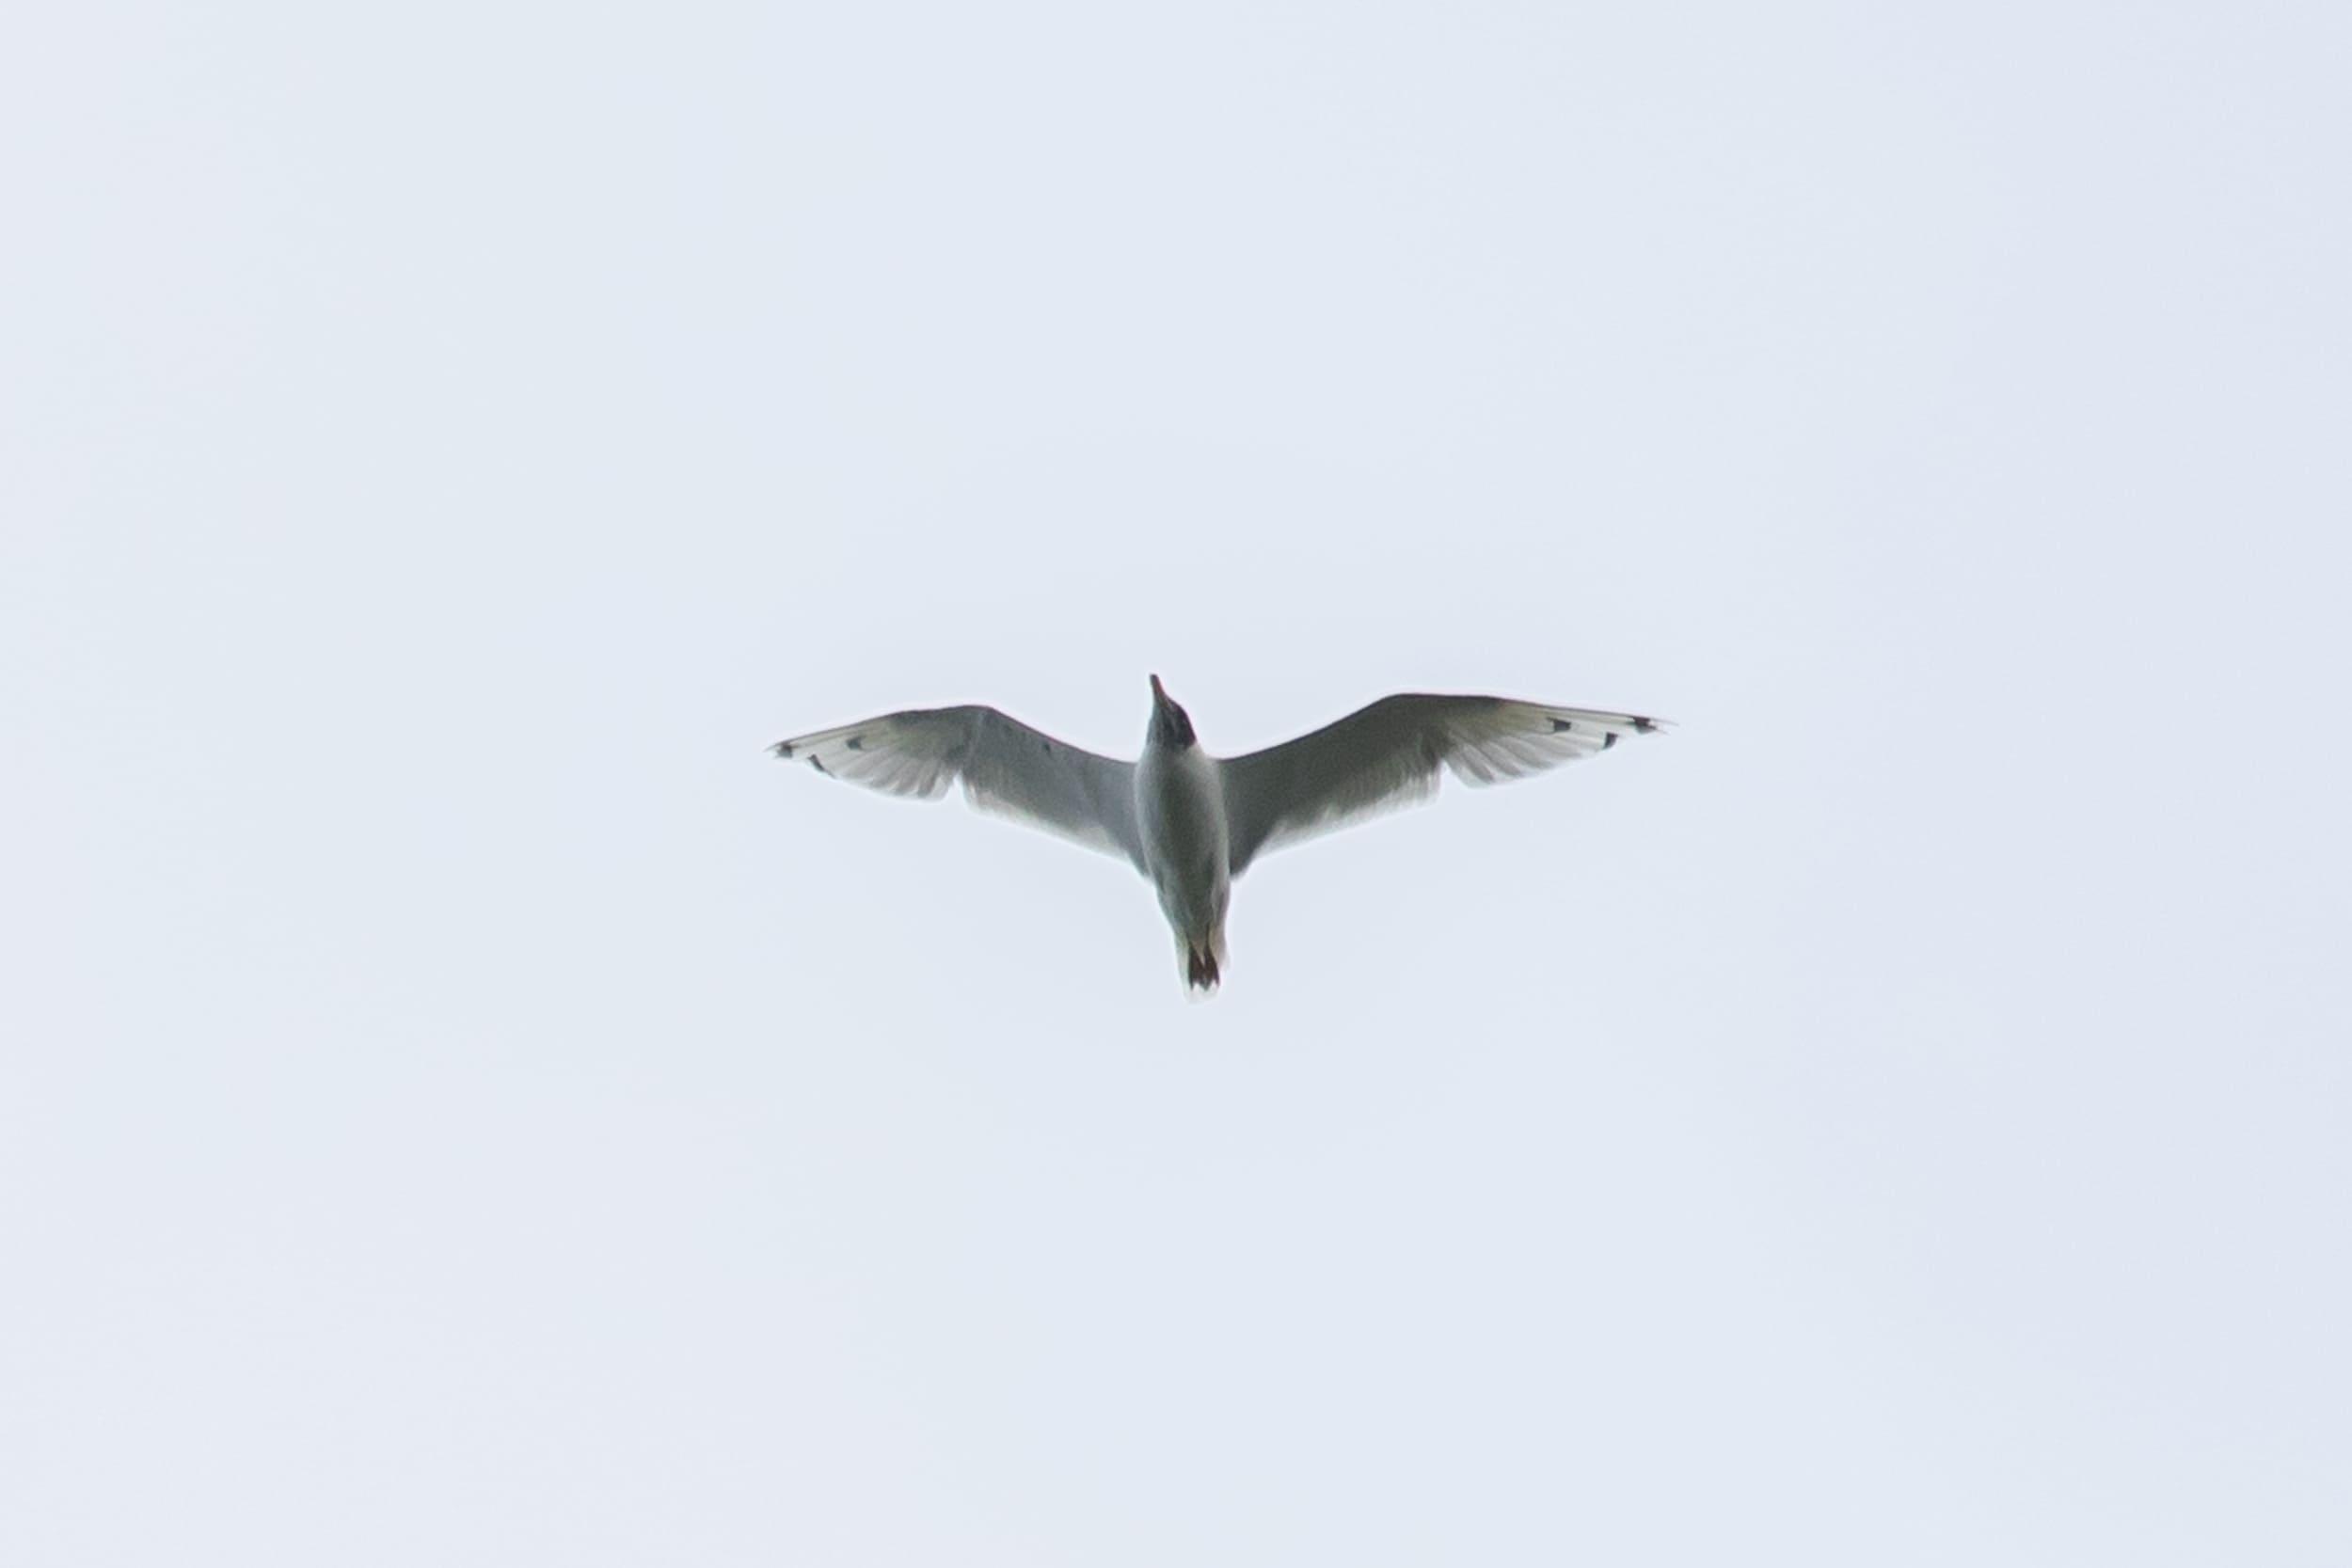 20180823-100,000 Birds-05-Web.jpg